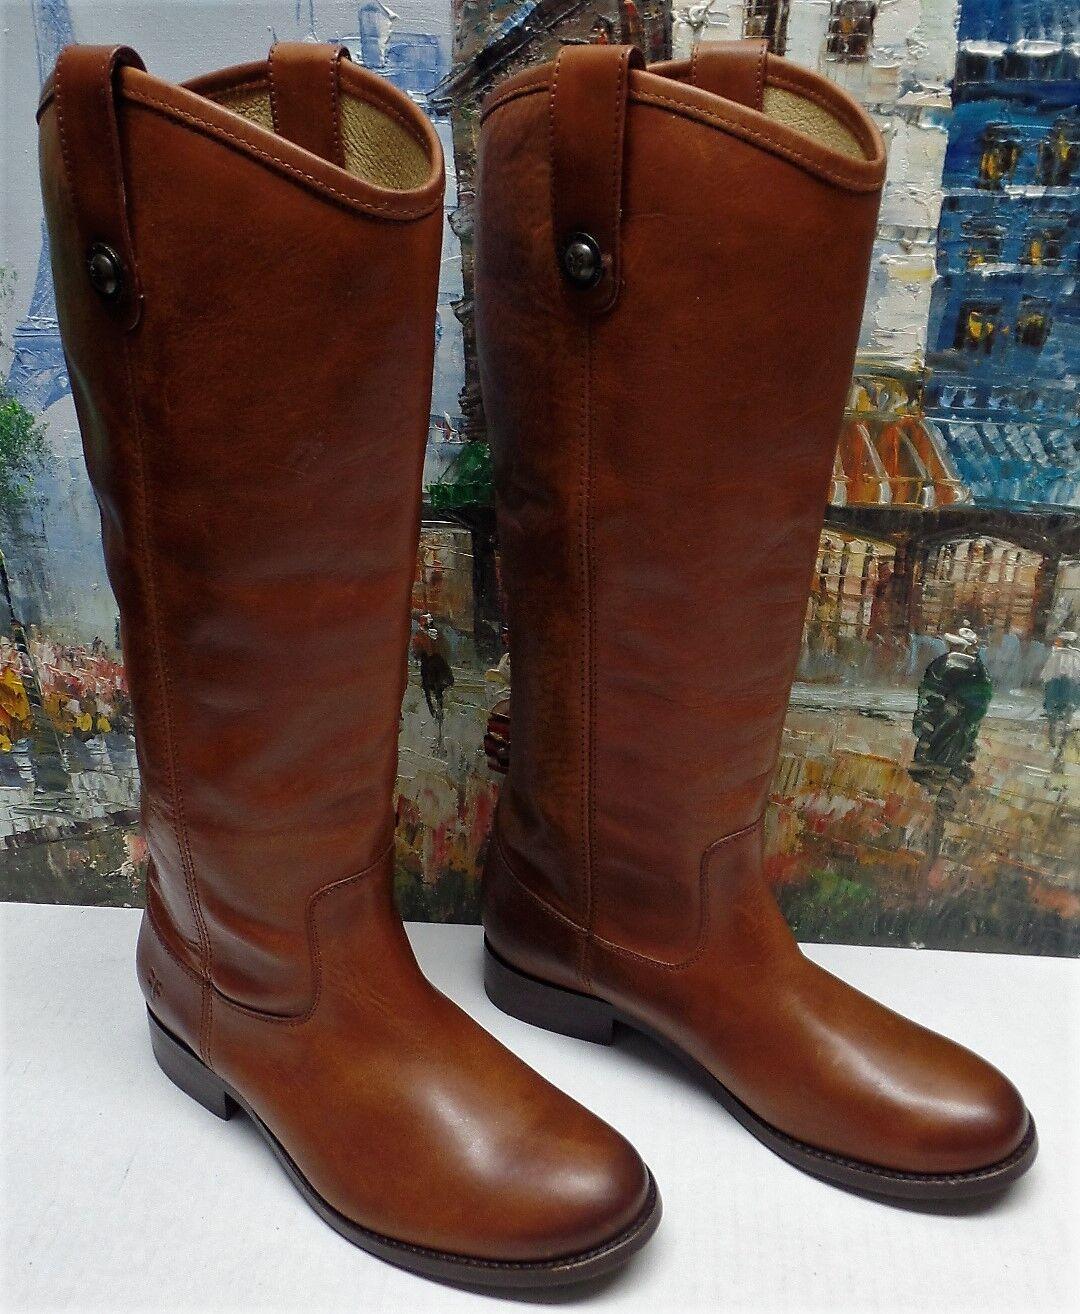 Frye 'Melissa Button' bota in Cognac marrón  - Talla 5.5B -